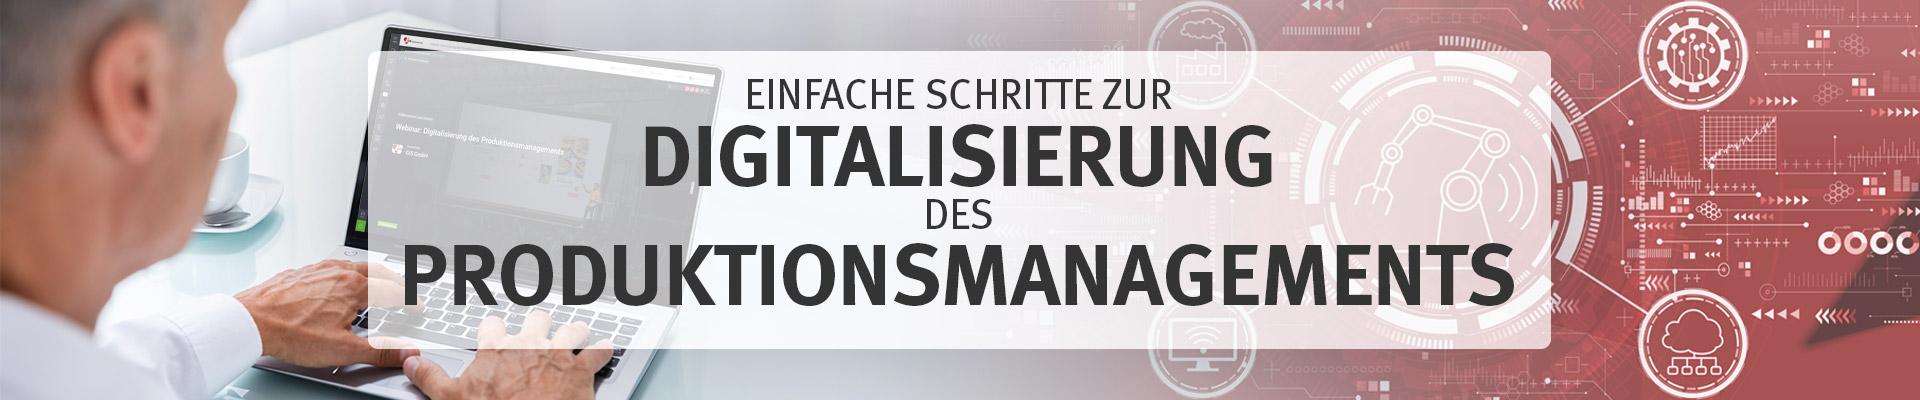 Bild Webinar Digitalisierung des Produktionsmanagements